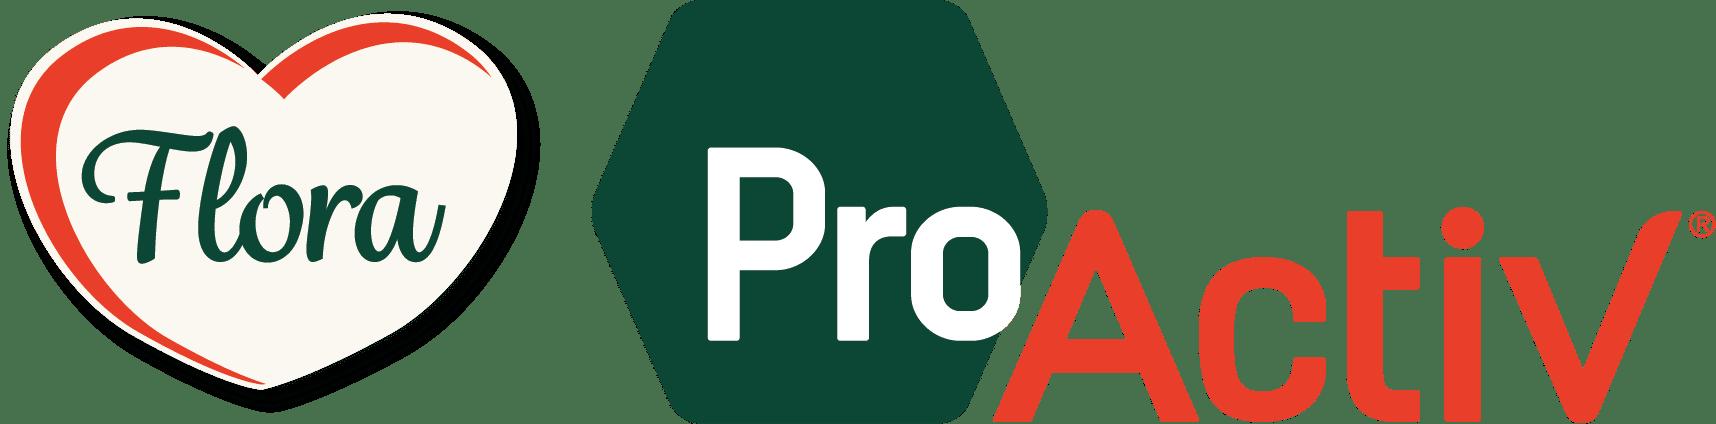 Flora Proactiv logo